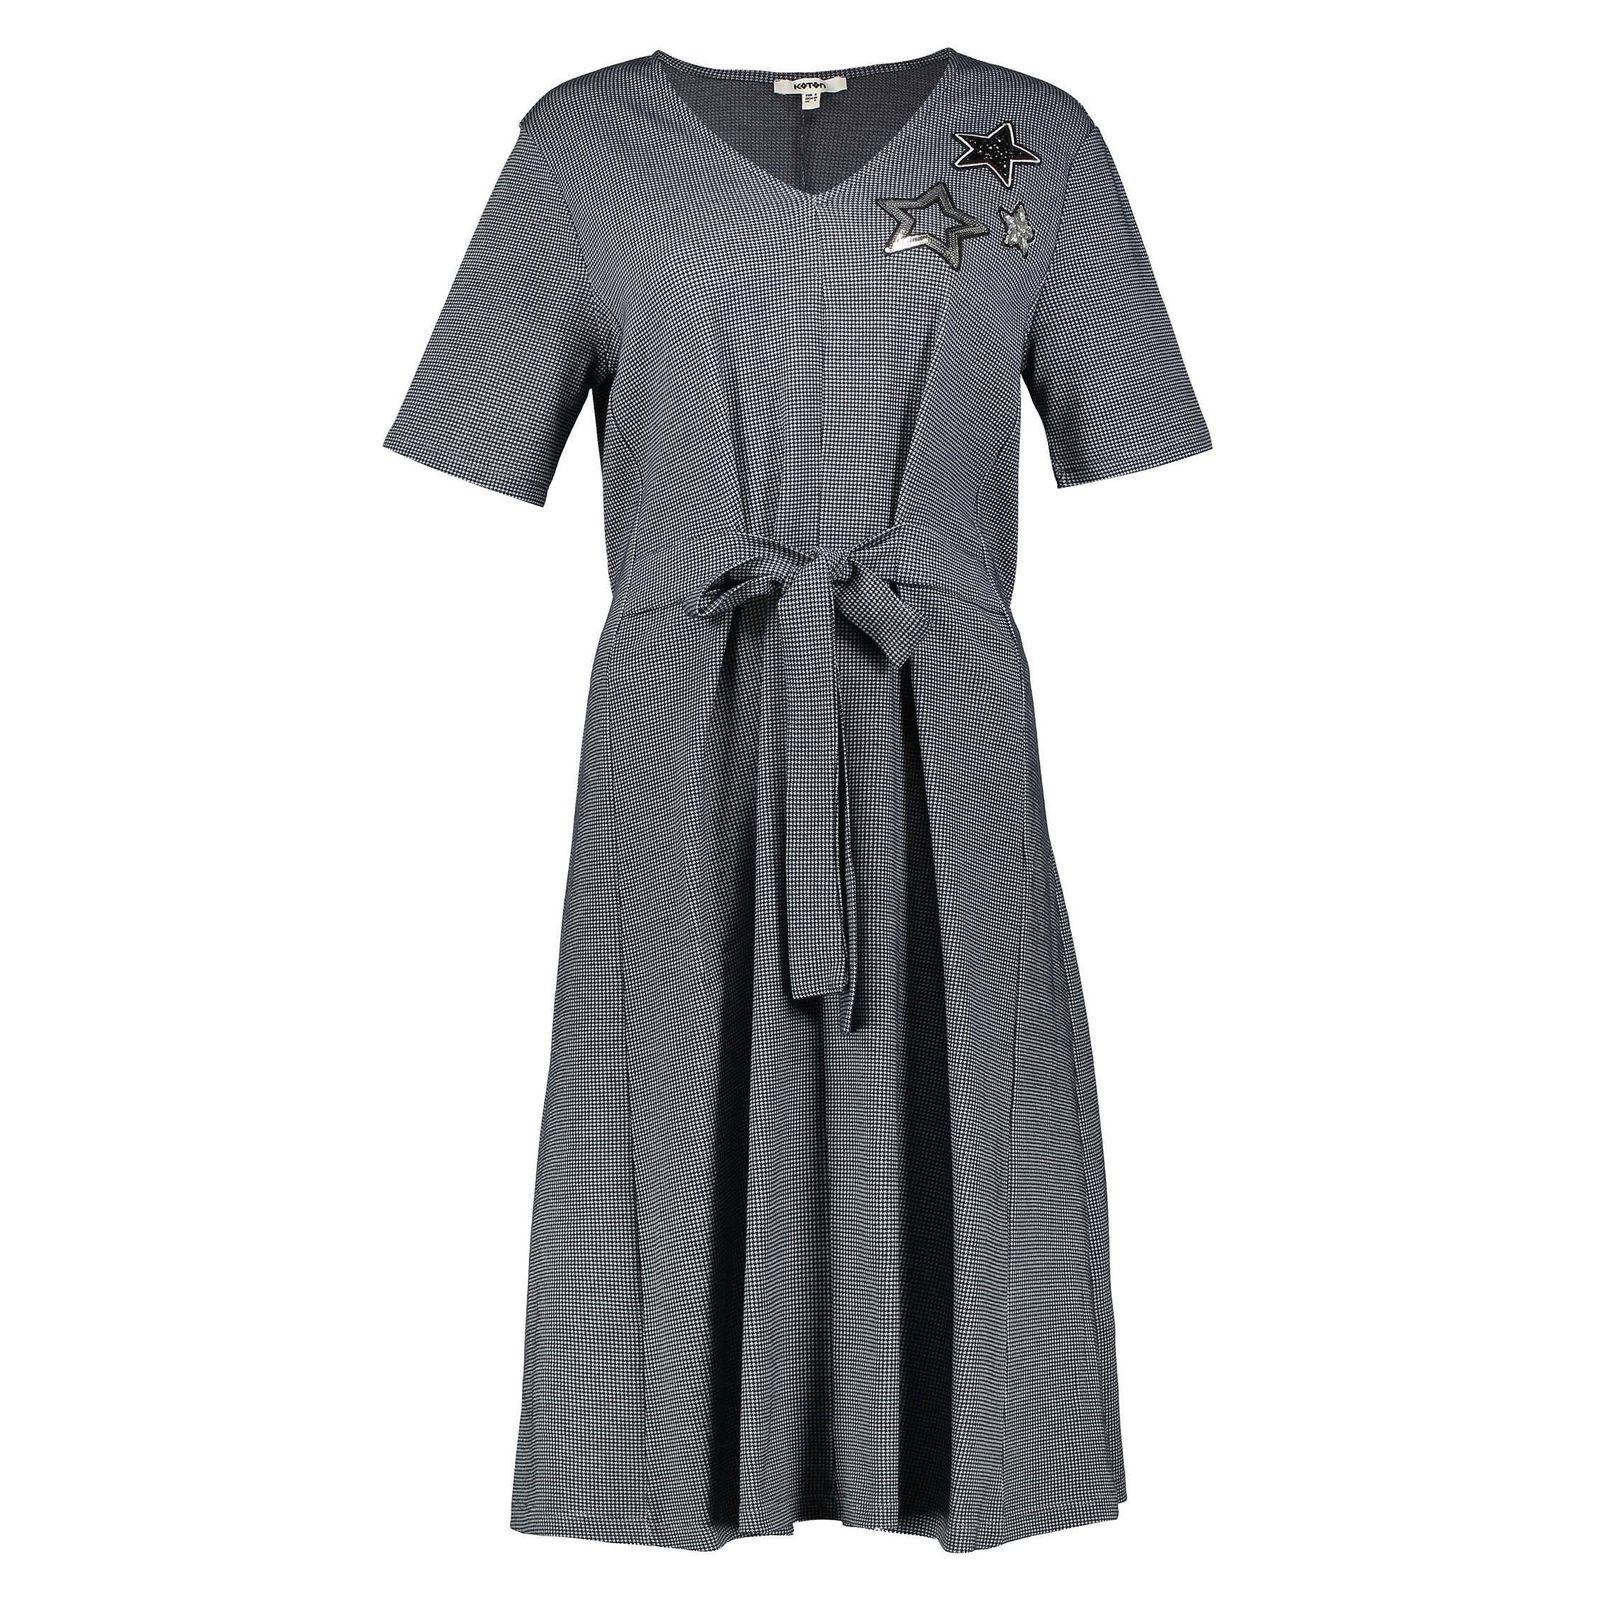 پیراهن نخی میدی زنانه - کوتون - آبي - 1